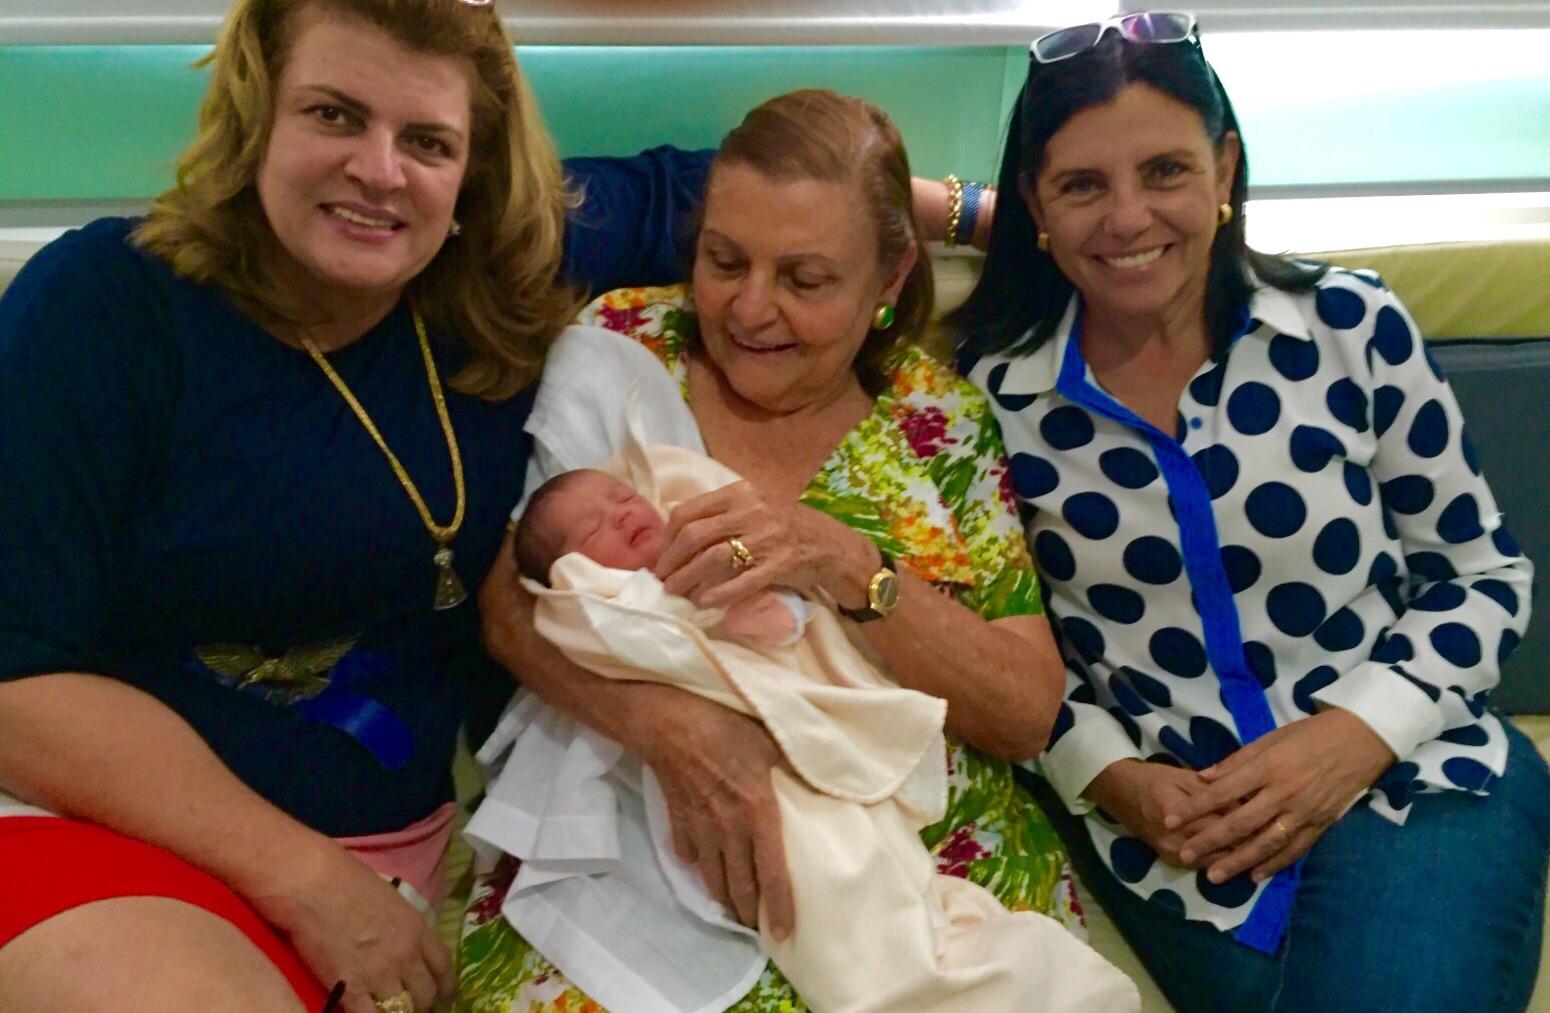 A avó materno Graça Amorim, a bisavó Marly Sarney e Roseana Sarney.